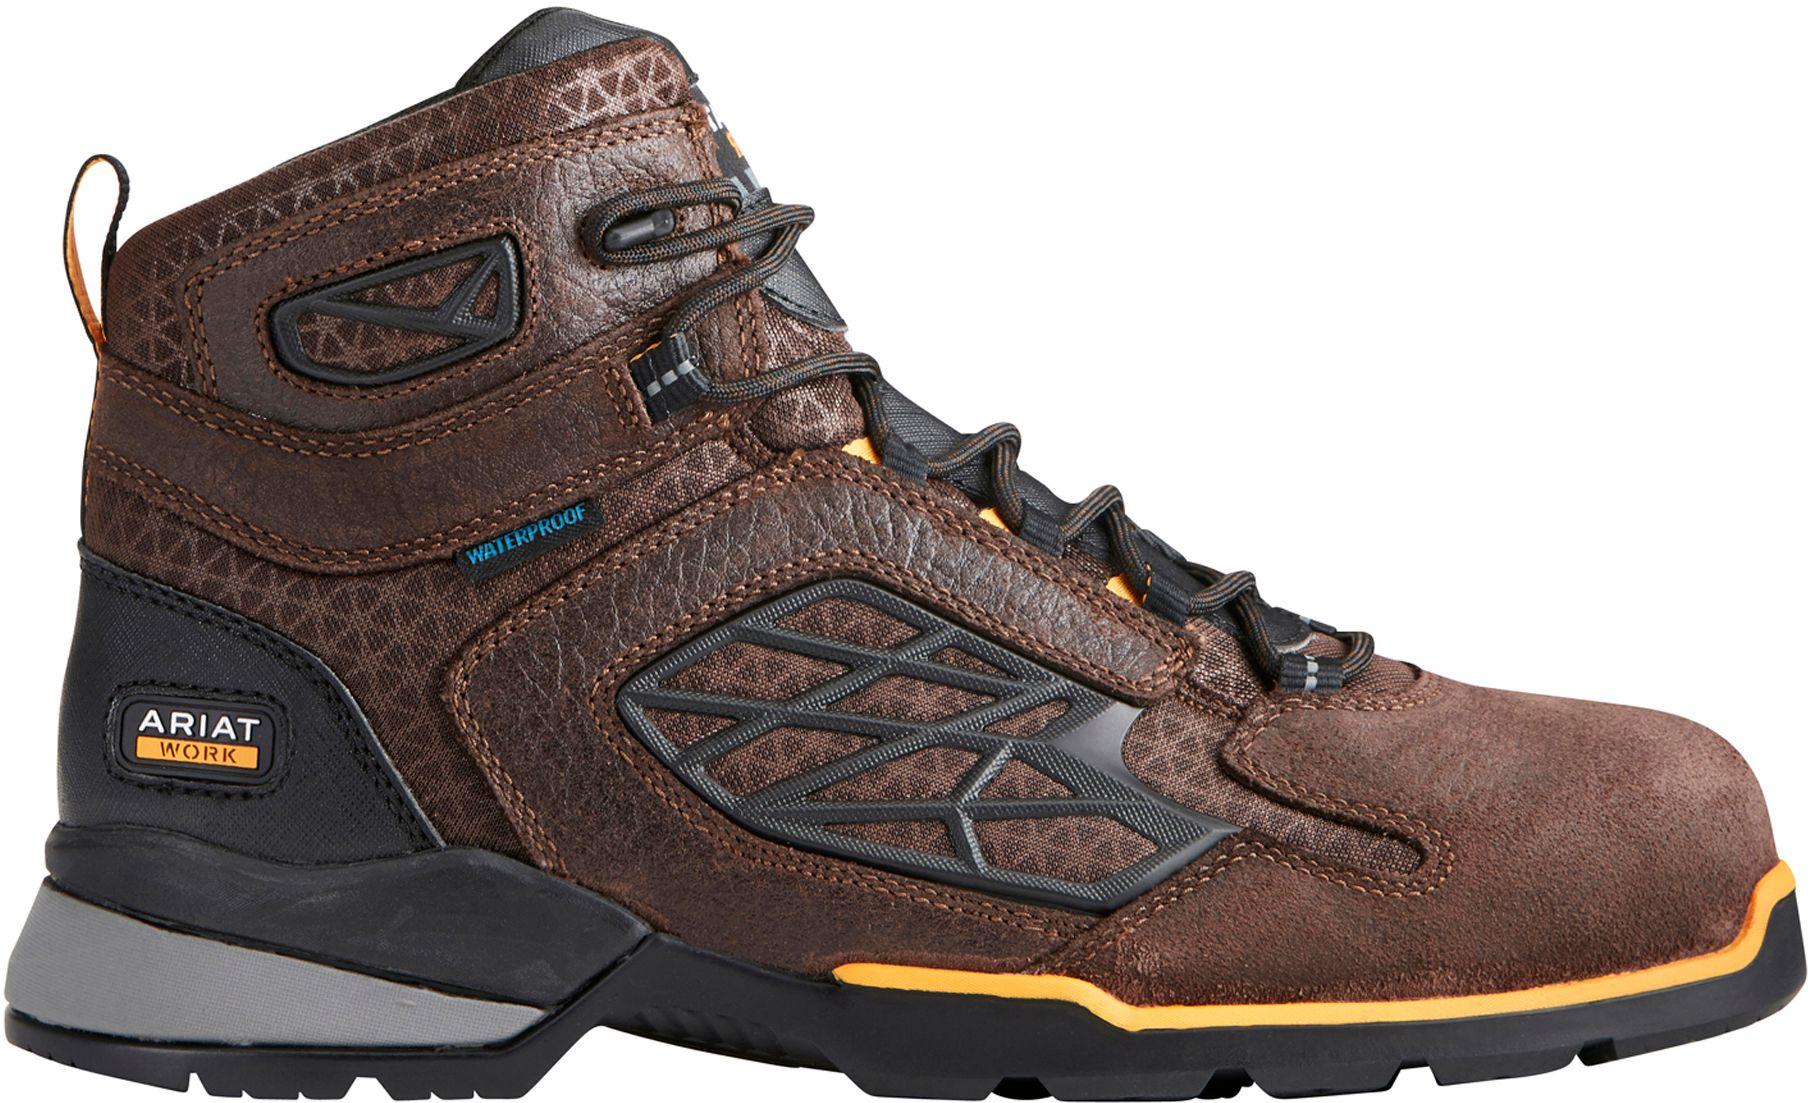 Ariat Rebar Flex 6 Composite Toe (Black) Mens Lace-up Boots